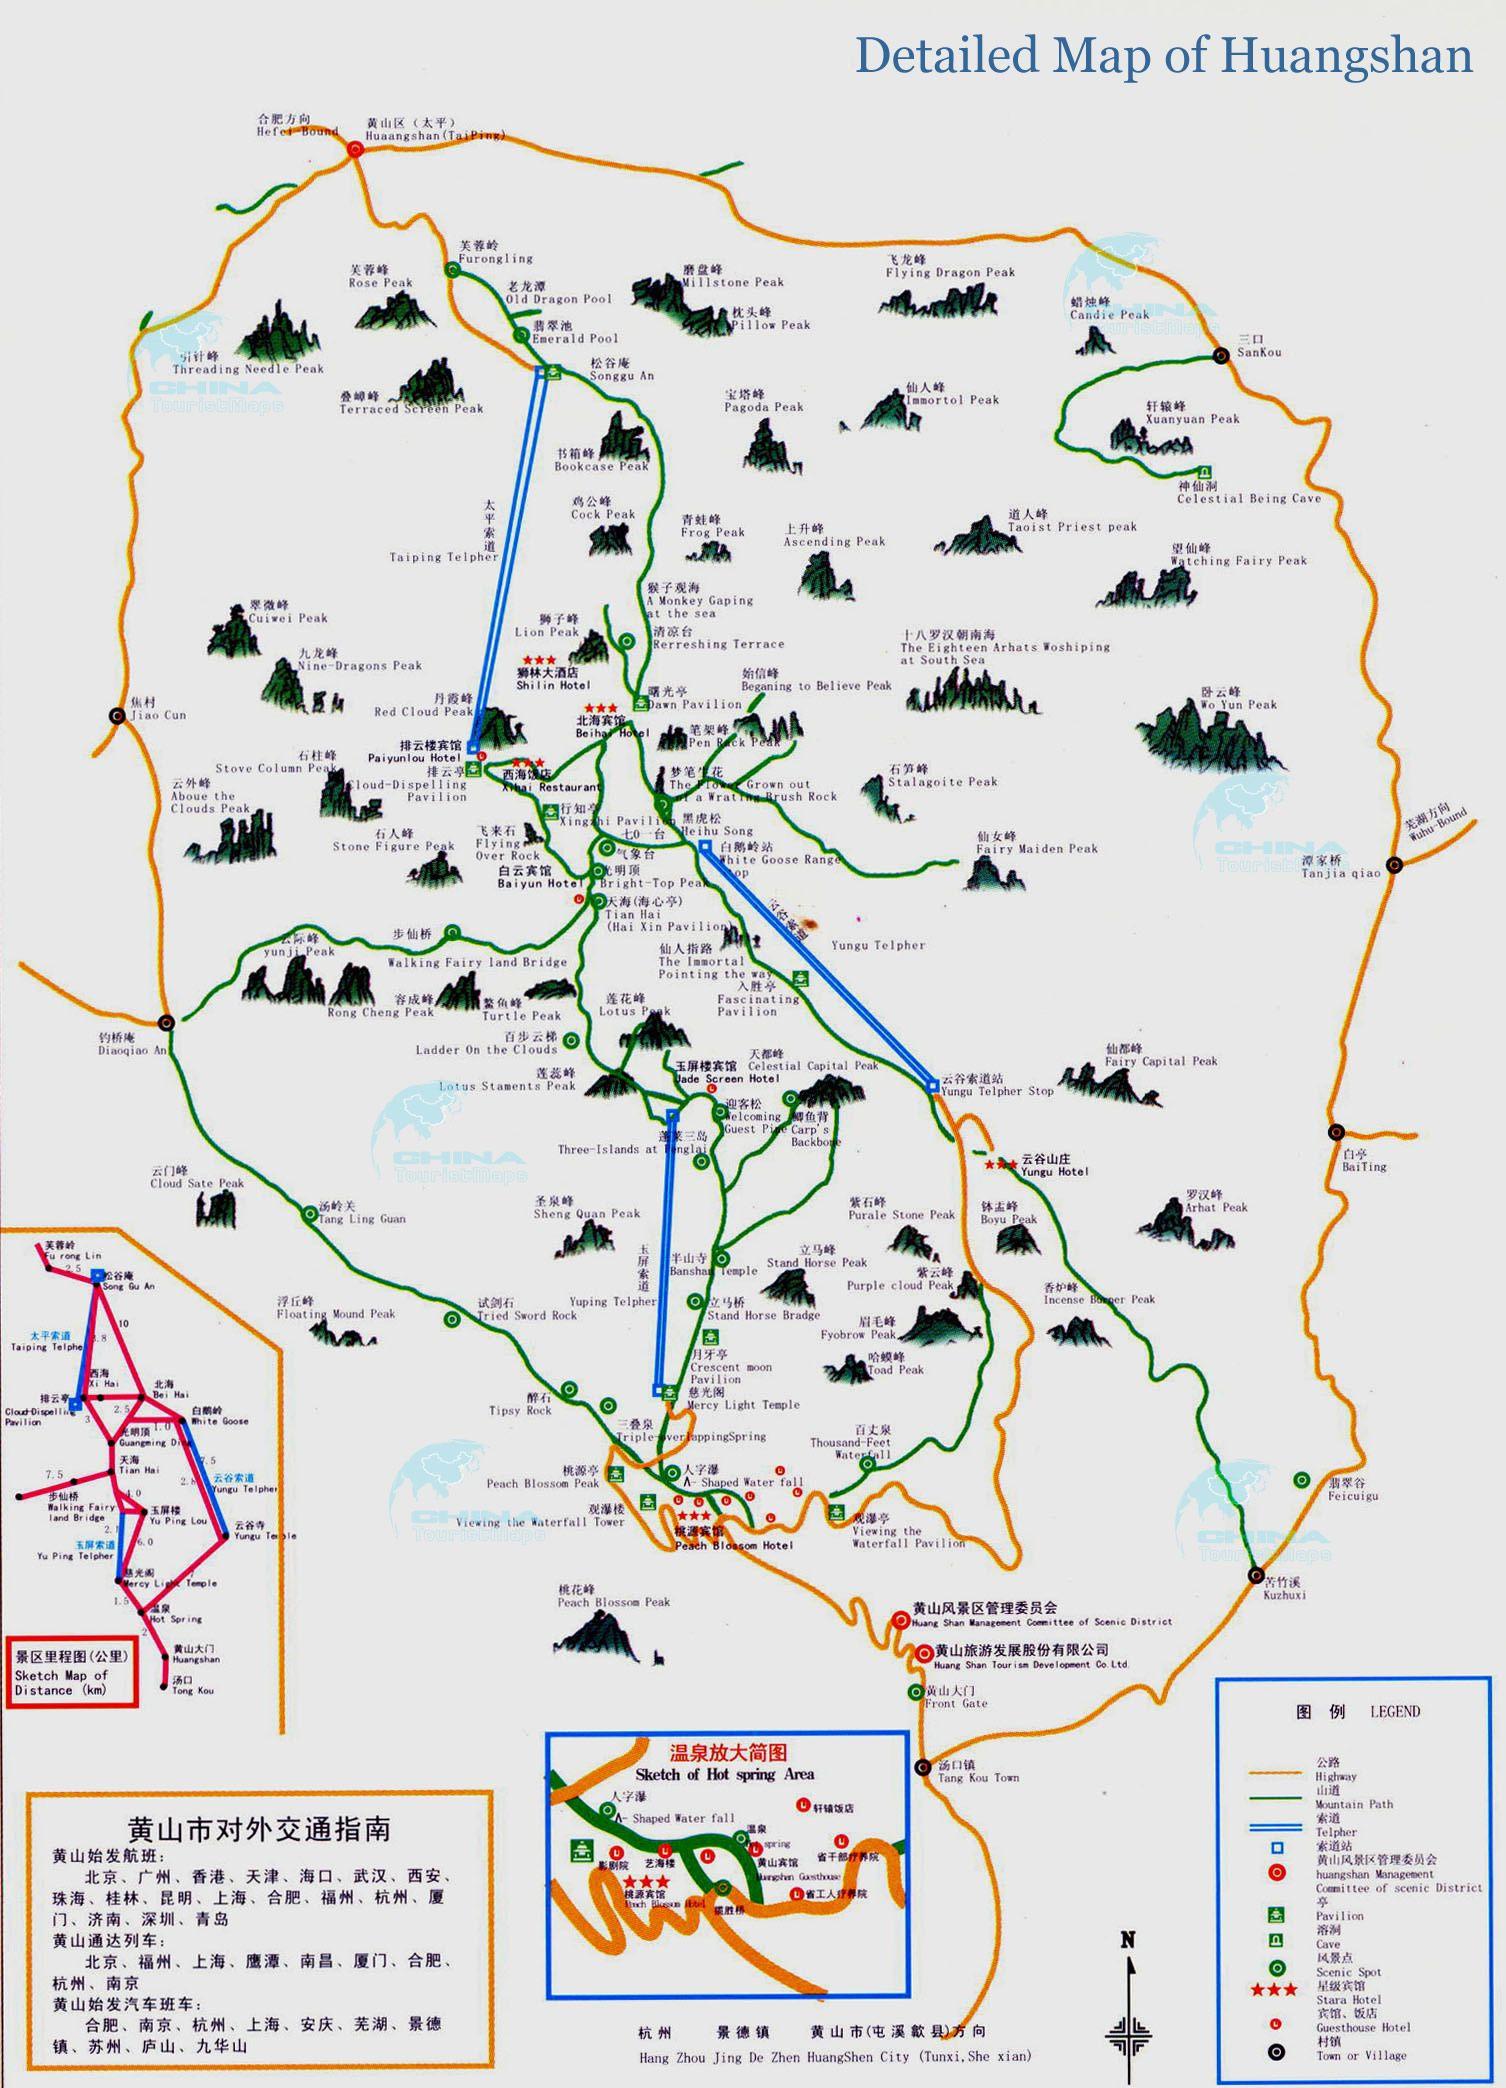 China Map In English.Huangshan Huang Shan Area Tourist Map English Hi Res Detailed